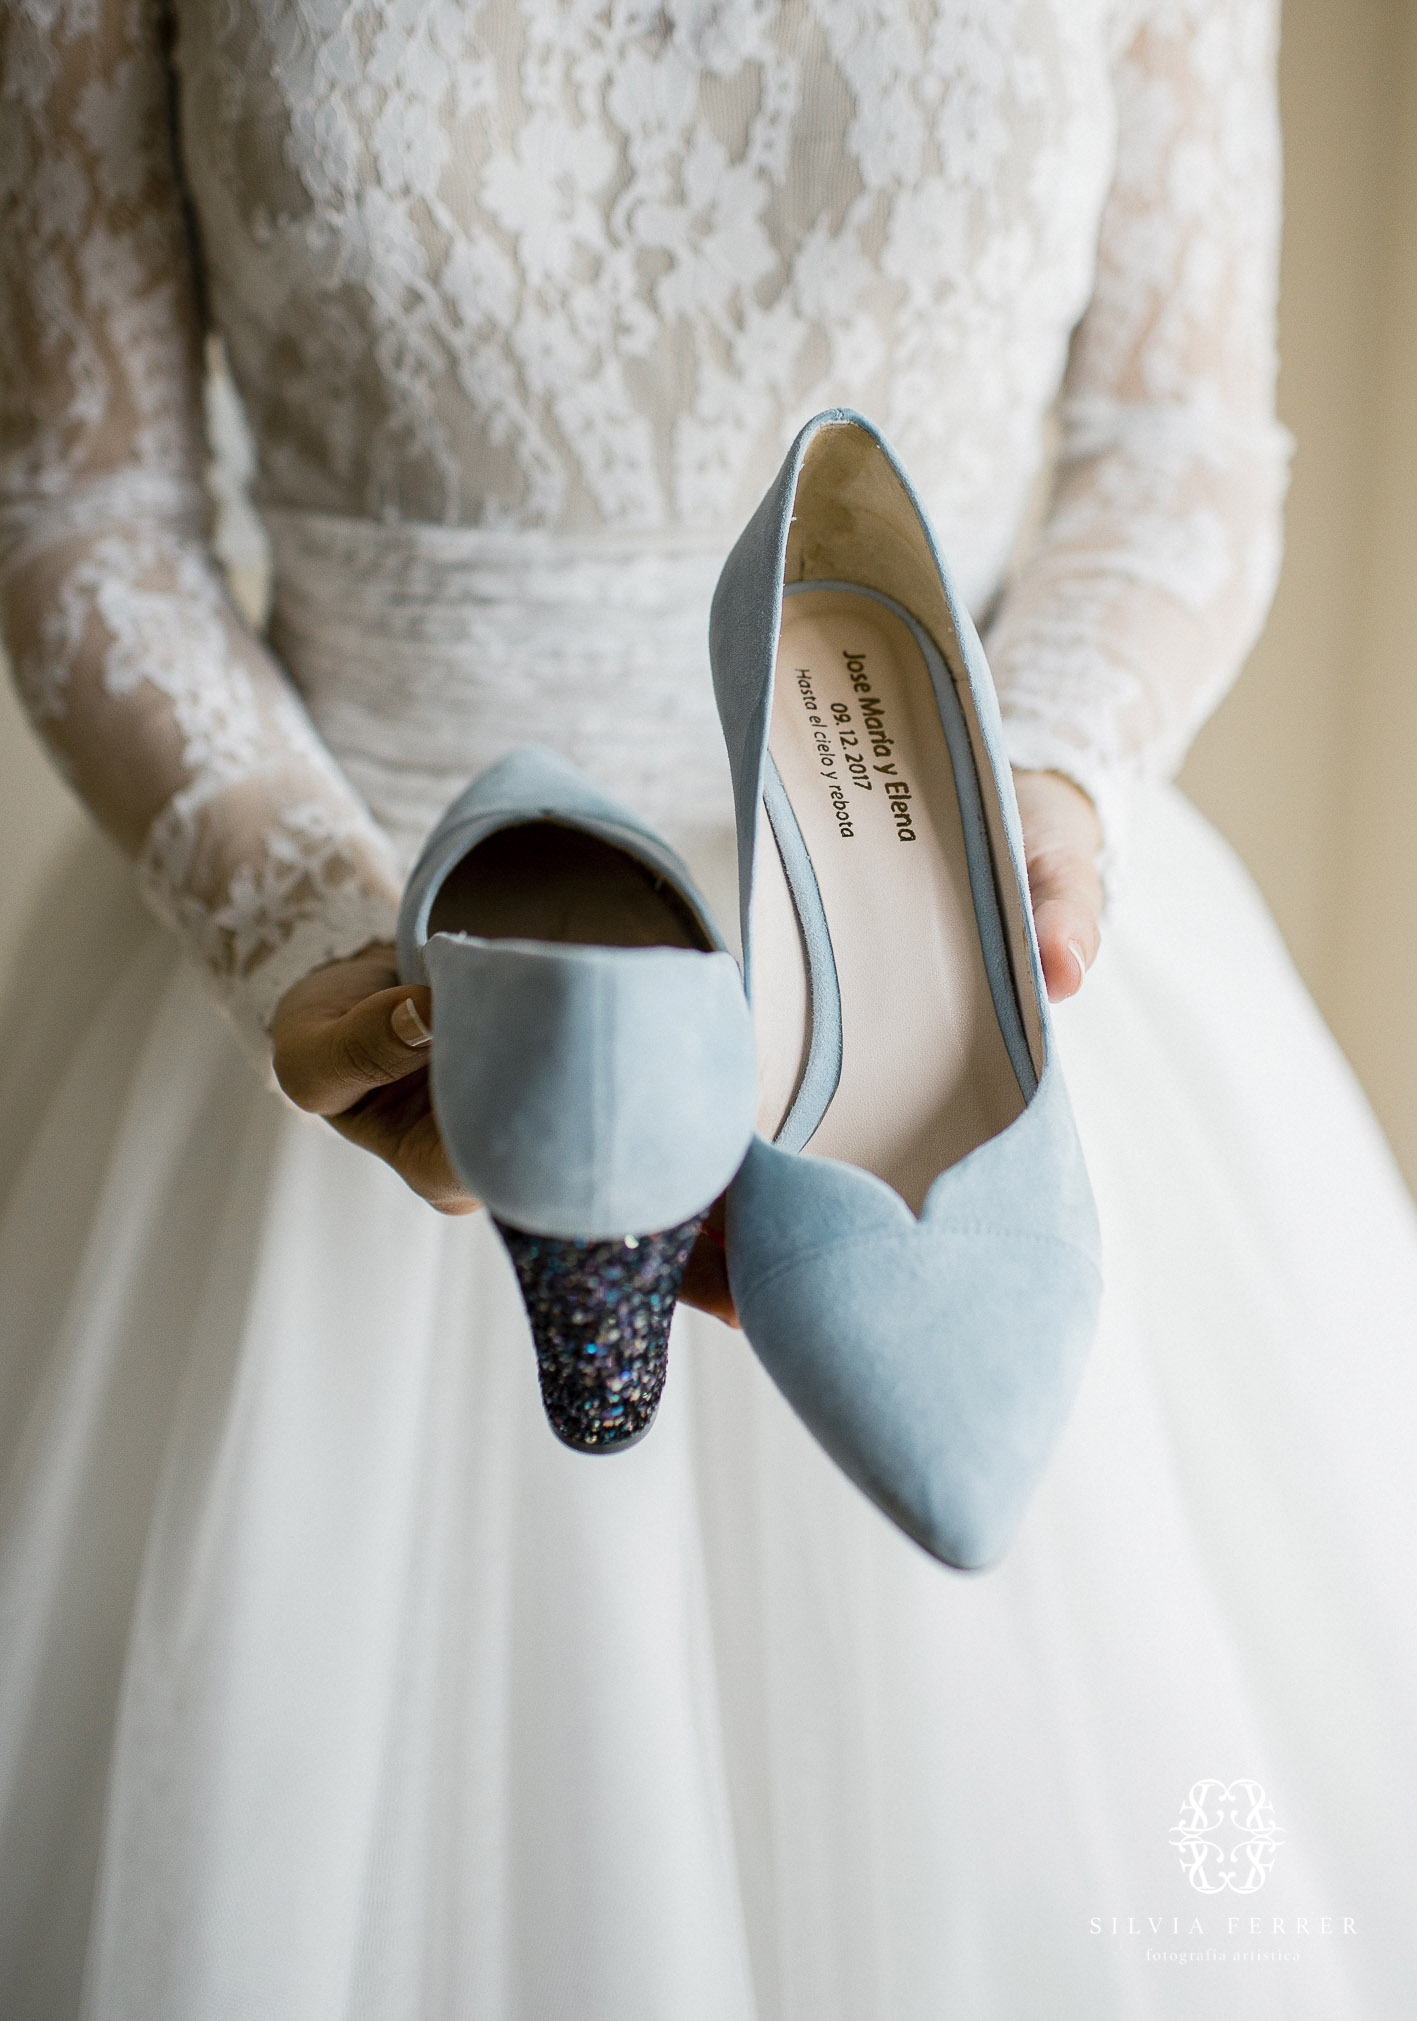 zapatos uniq shoes novia de invierno